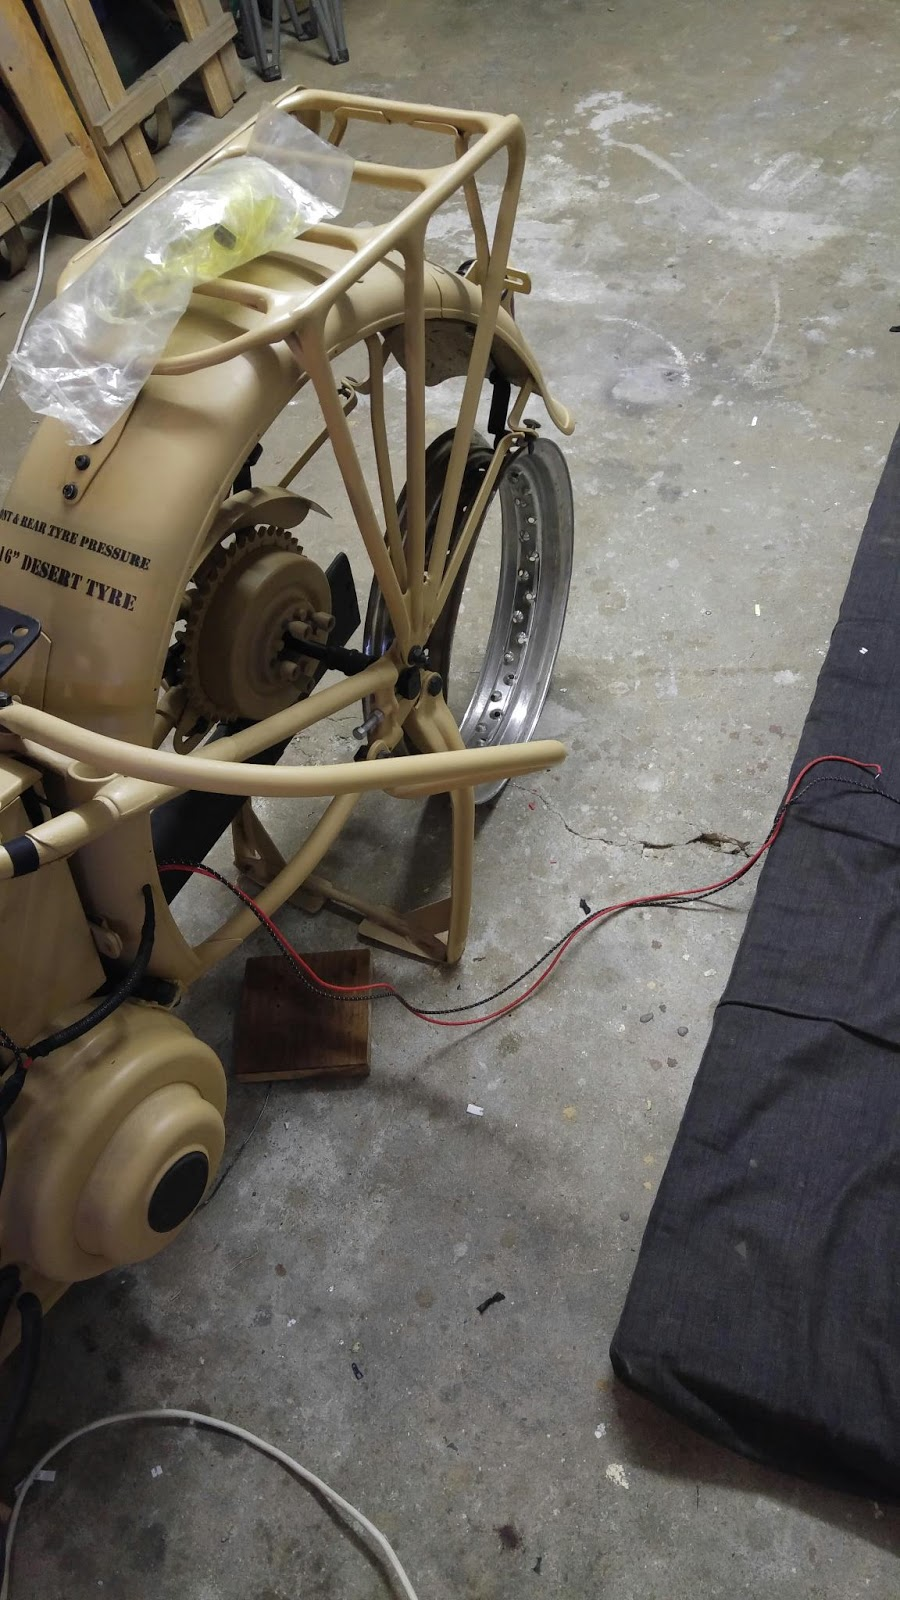 1941 Harley Davidson WL Restoration : ing the Rear Light ... on